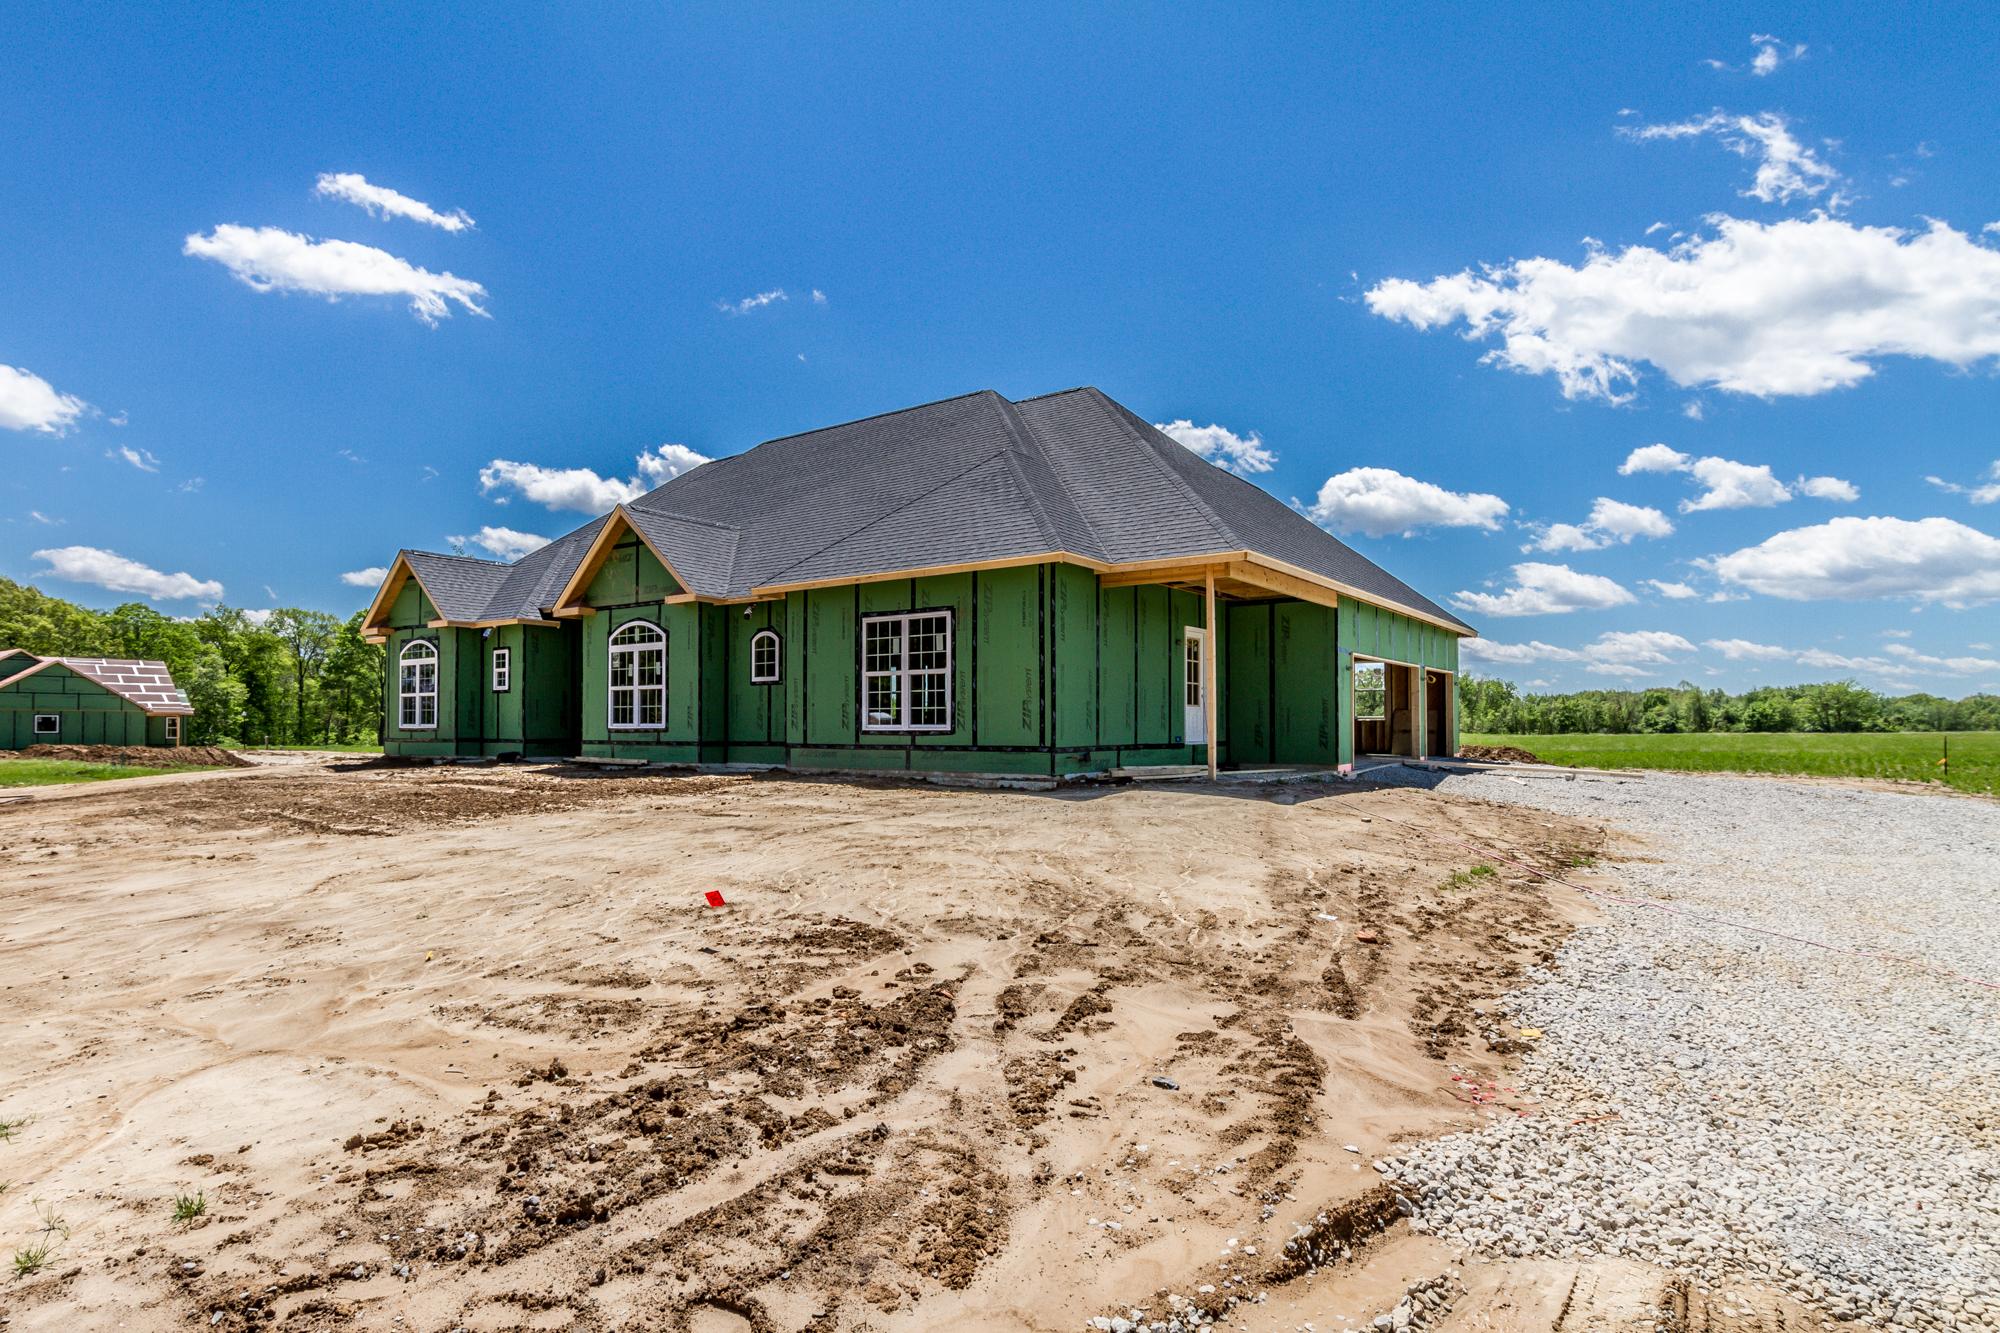 Bethel_Ridge_Farms_O'Fallon_Illinois_Progress_5.3.17-11.jpg